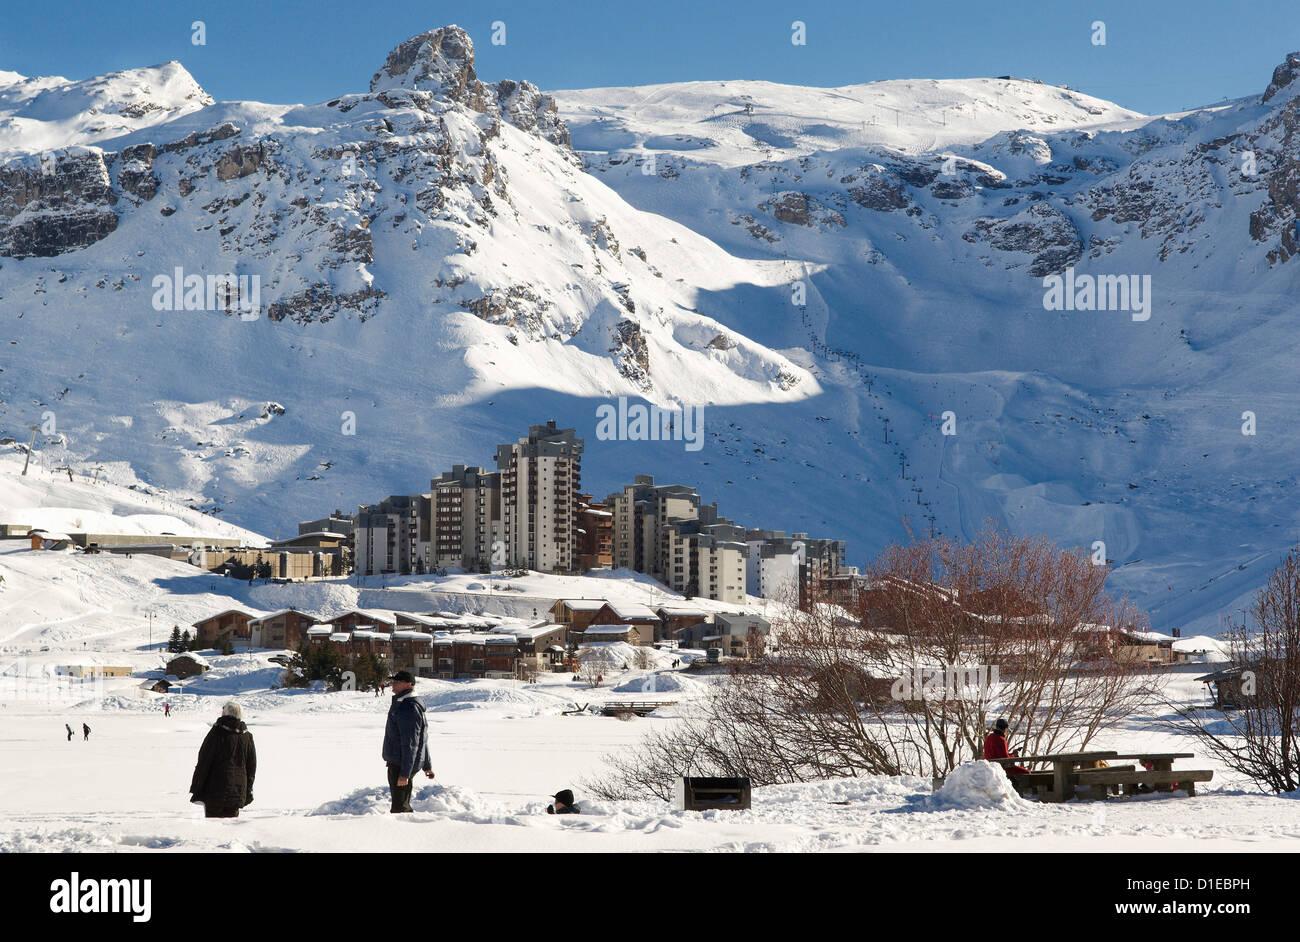 10 Most Beautiful European Ski Resorts For Alpine Fans Cnn